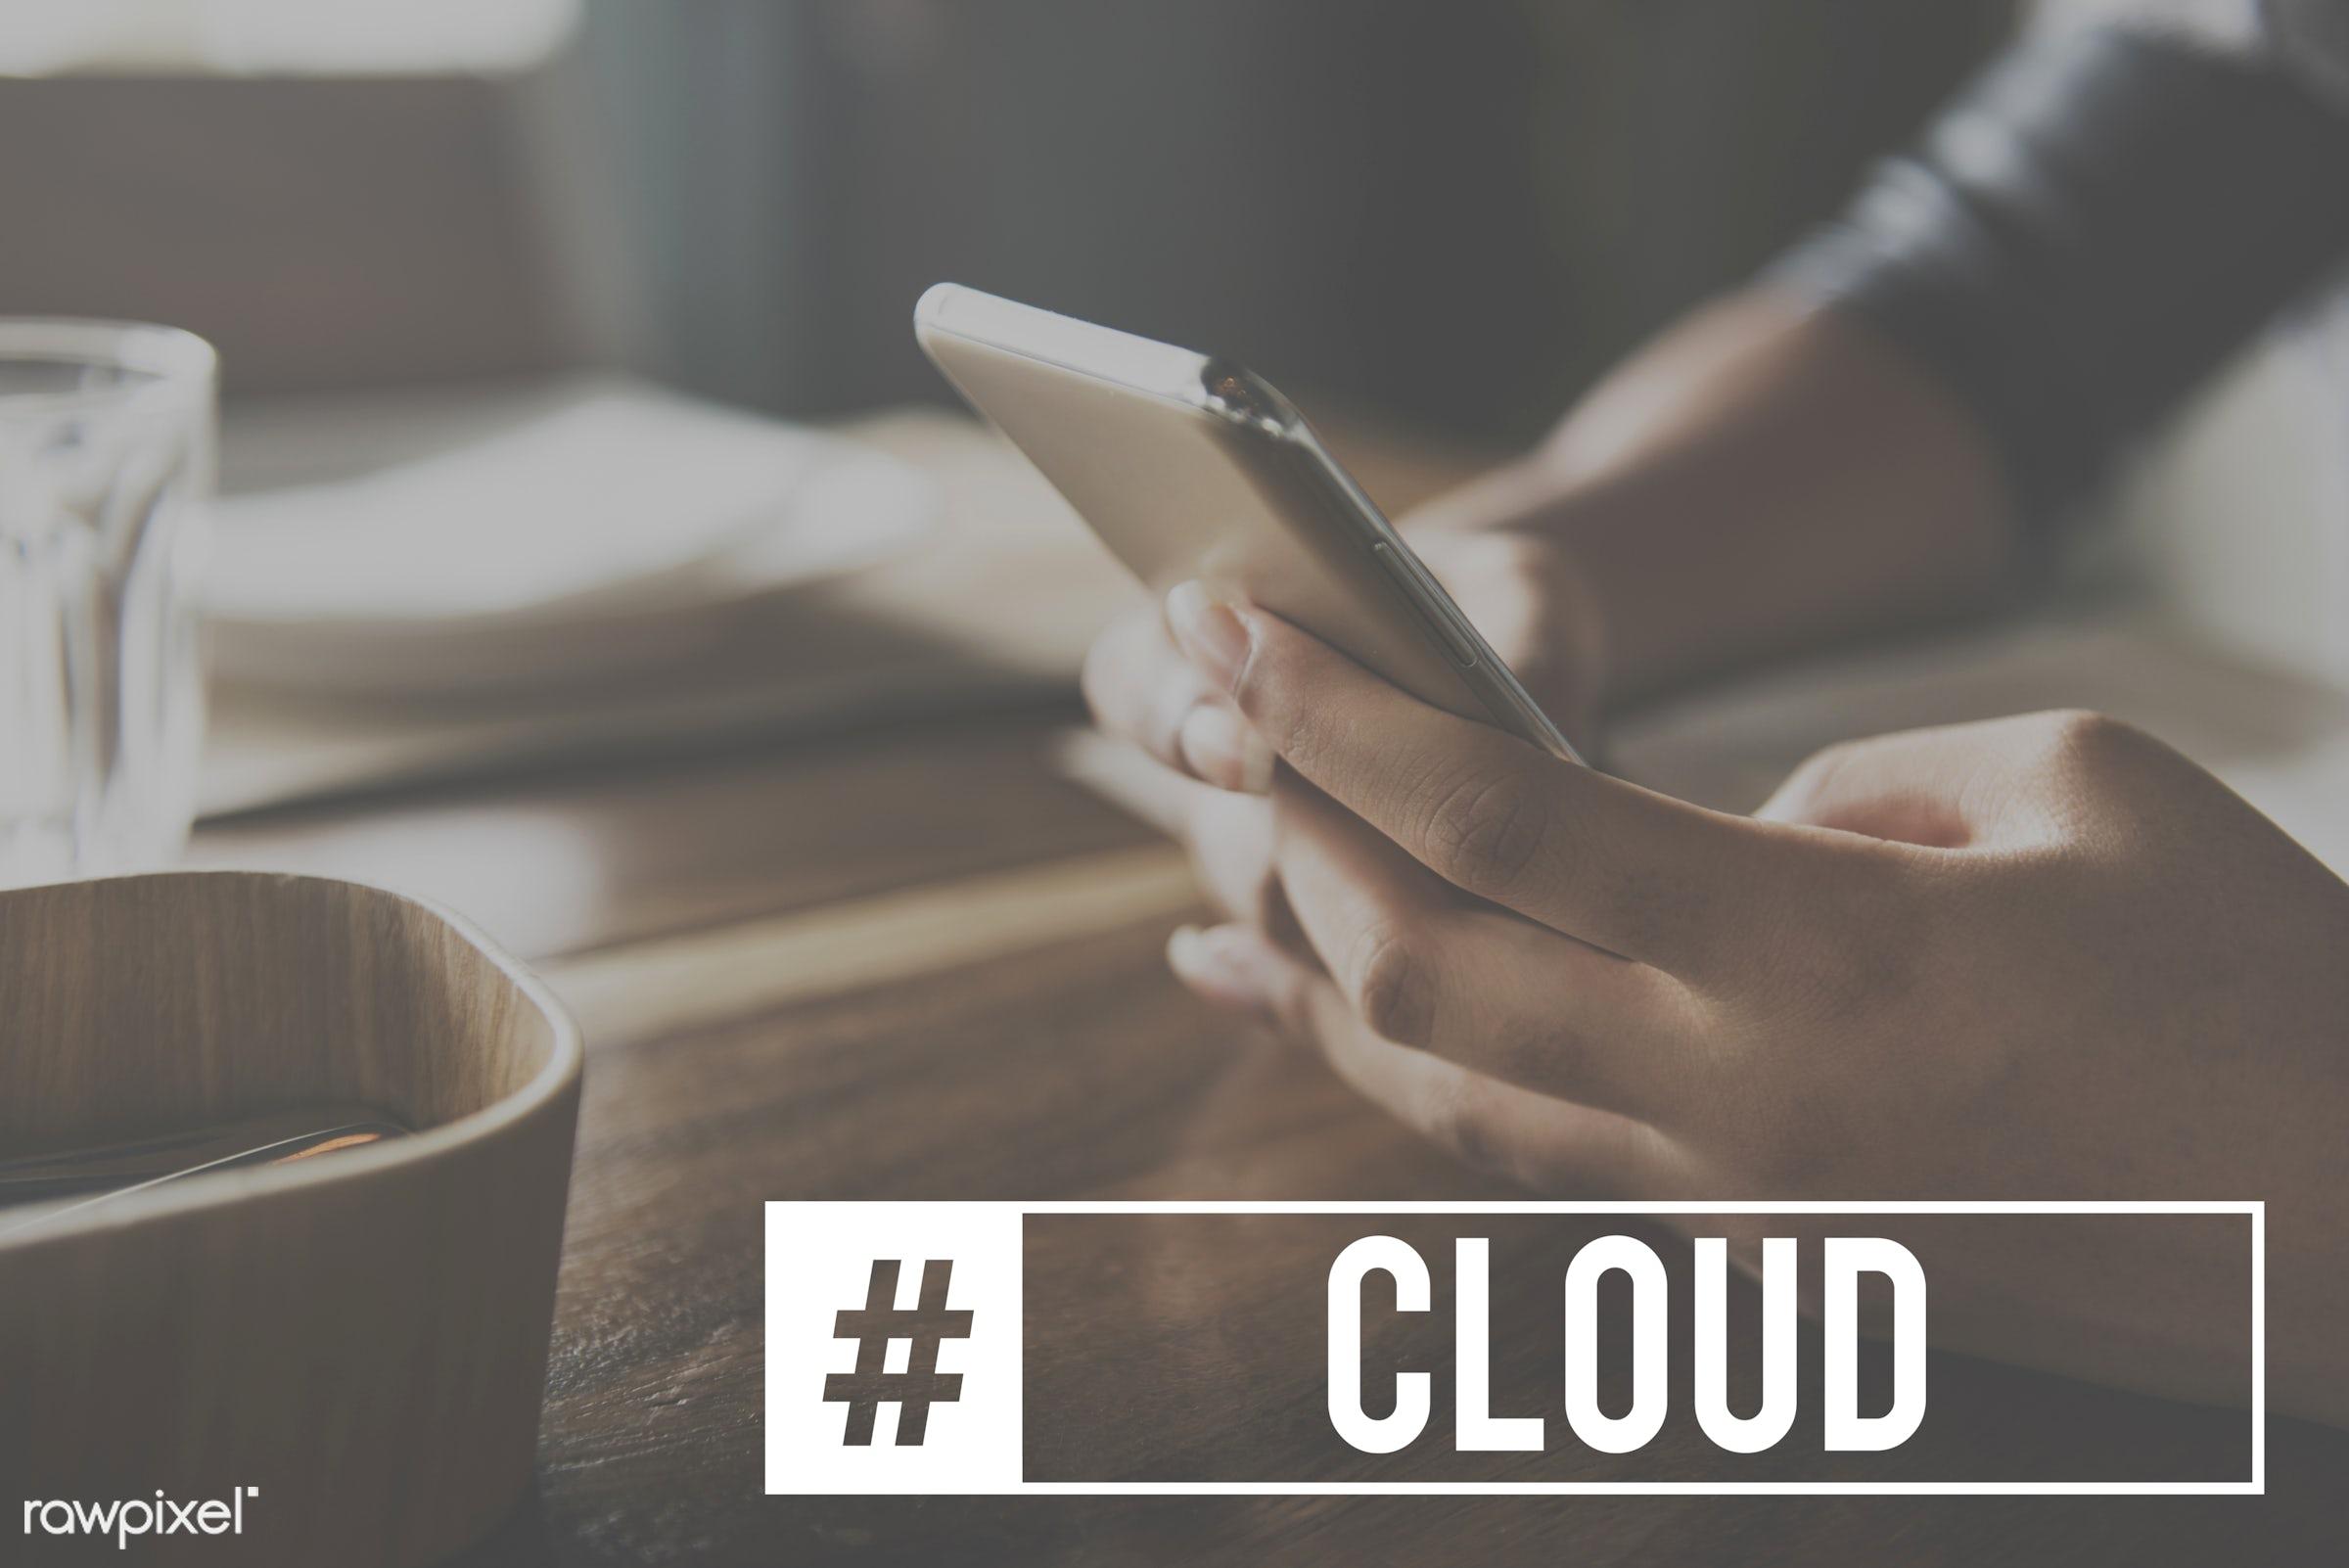 admin, amusement, application, break, browser, cellphone, cloud, code, community, component, content, cyber, device, digital...